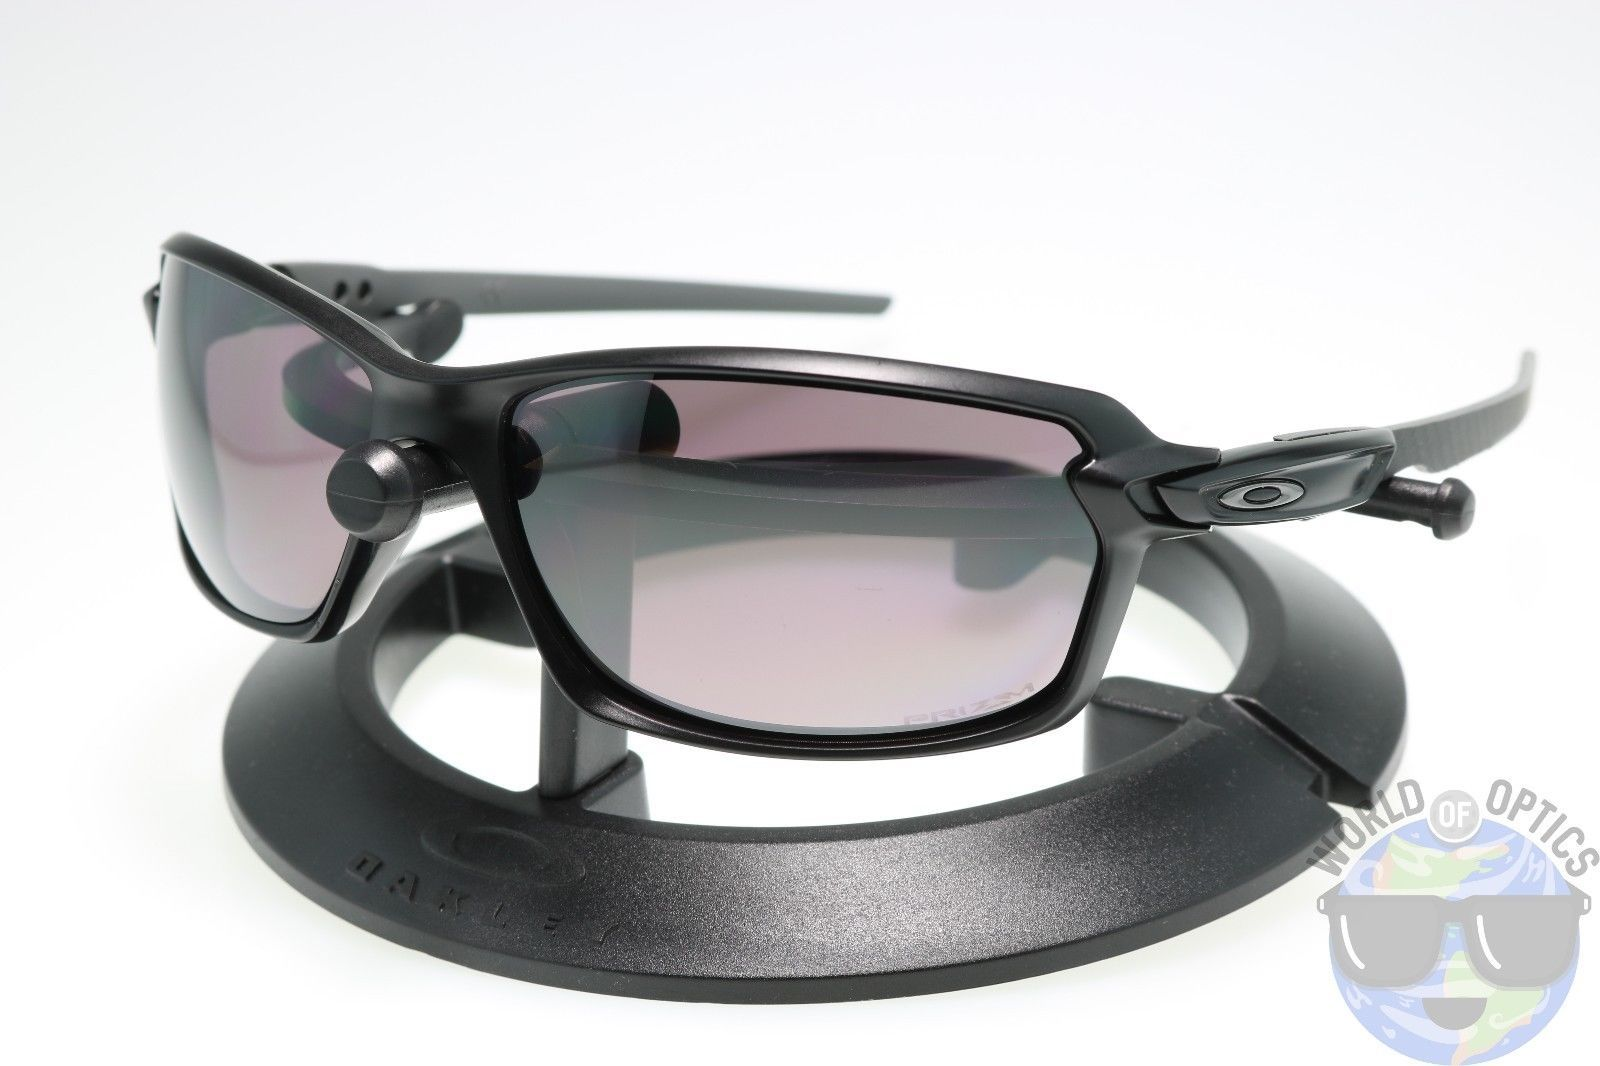 ad19241b35 Oakley Carbon Shift Sunglasses OO9302-06 Matte Black w  PRIZM Daily  Polarized